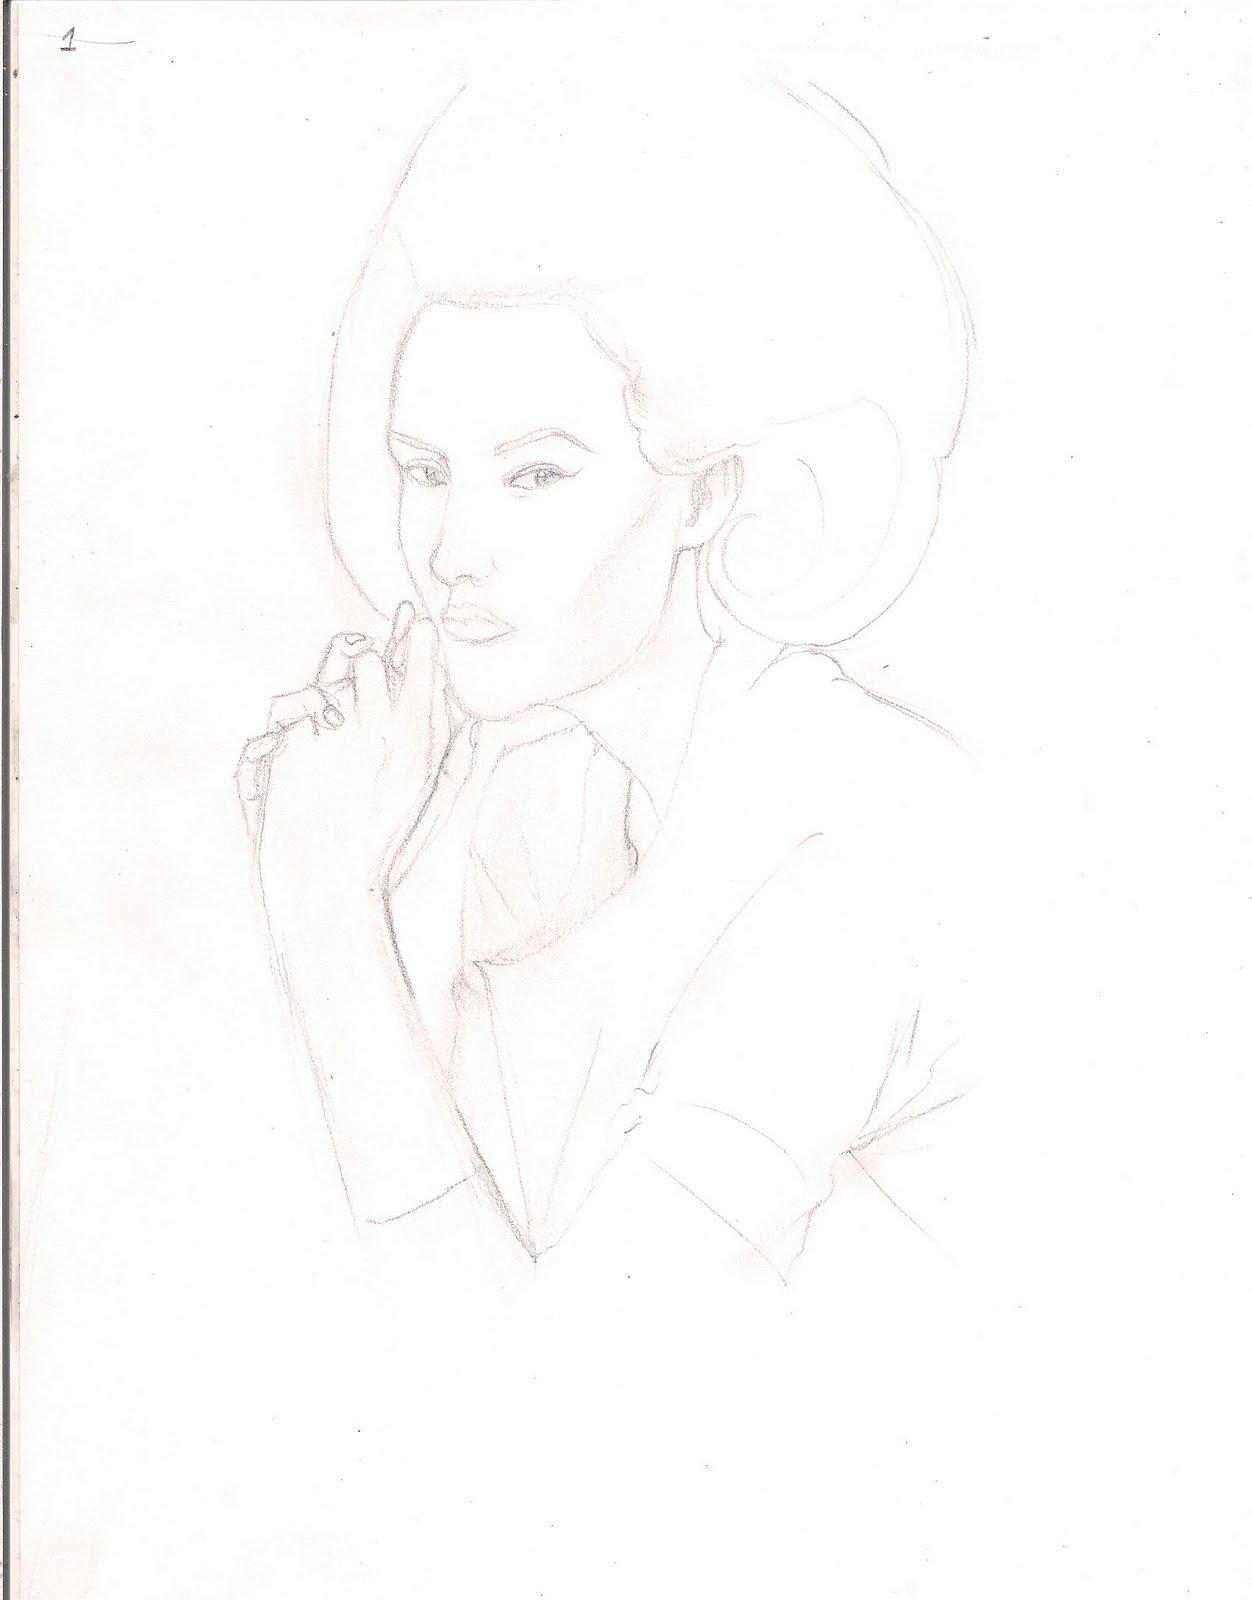 dibujo de una mujer paso a paso ( dibujarte)